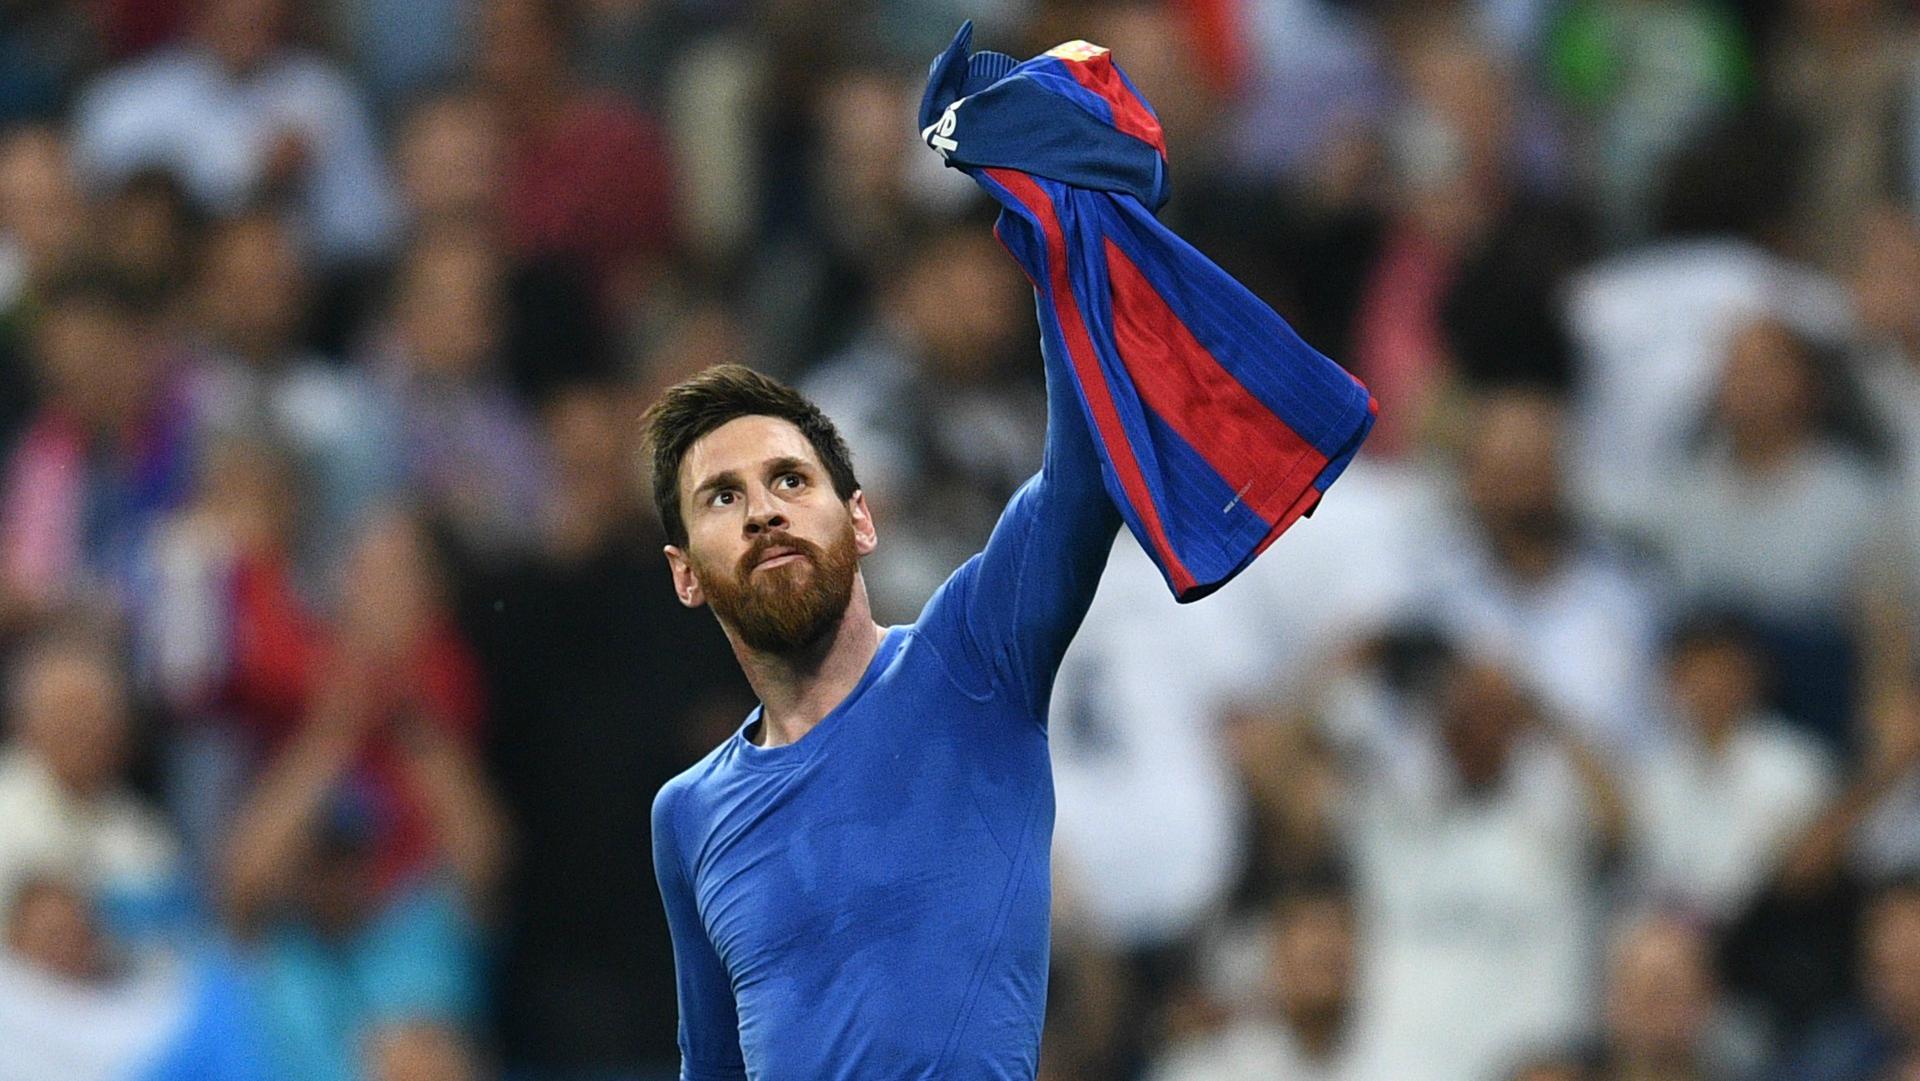 20171222_Messi_Uniform